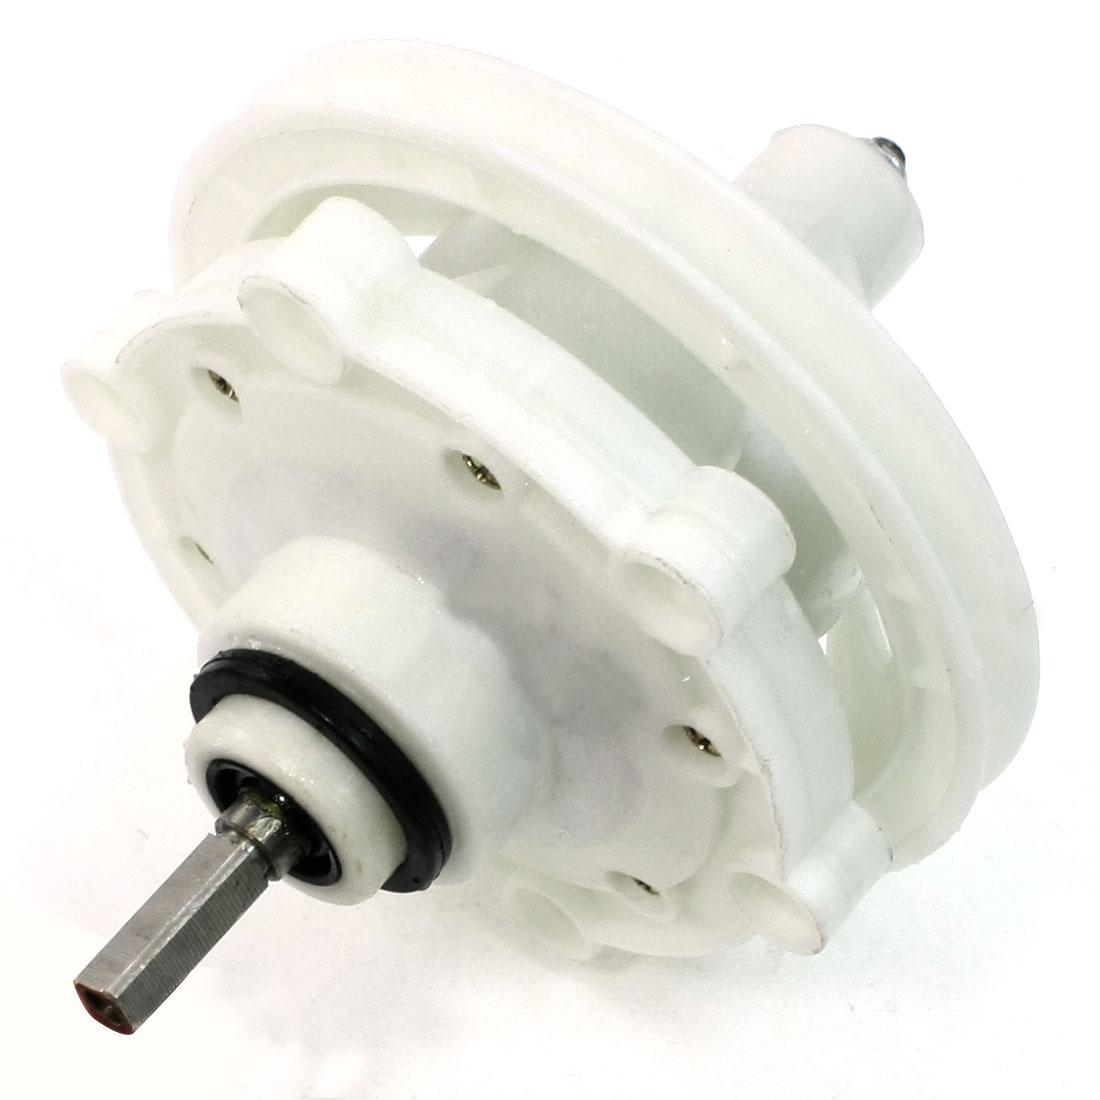 6.5mm Dia Square Shaft Inner Thread Washing Machine Gear Box Reducer